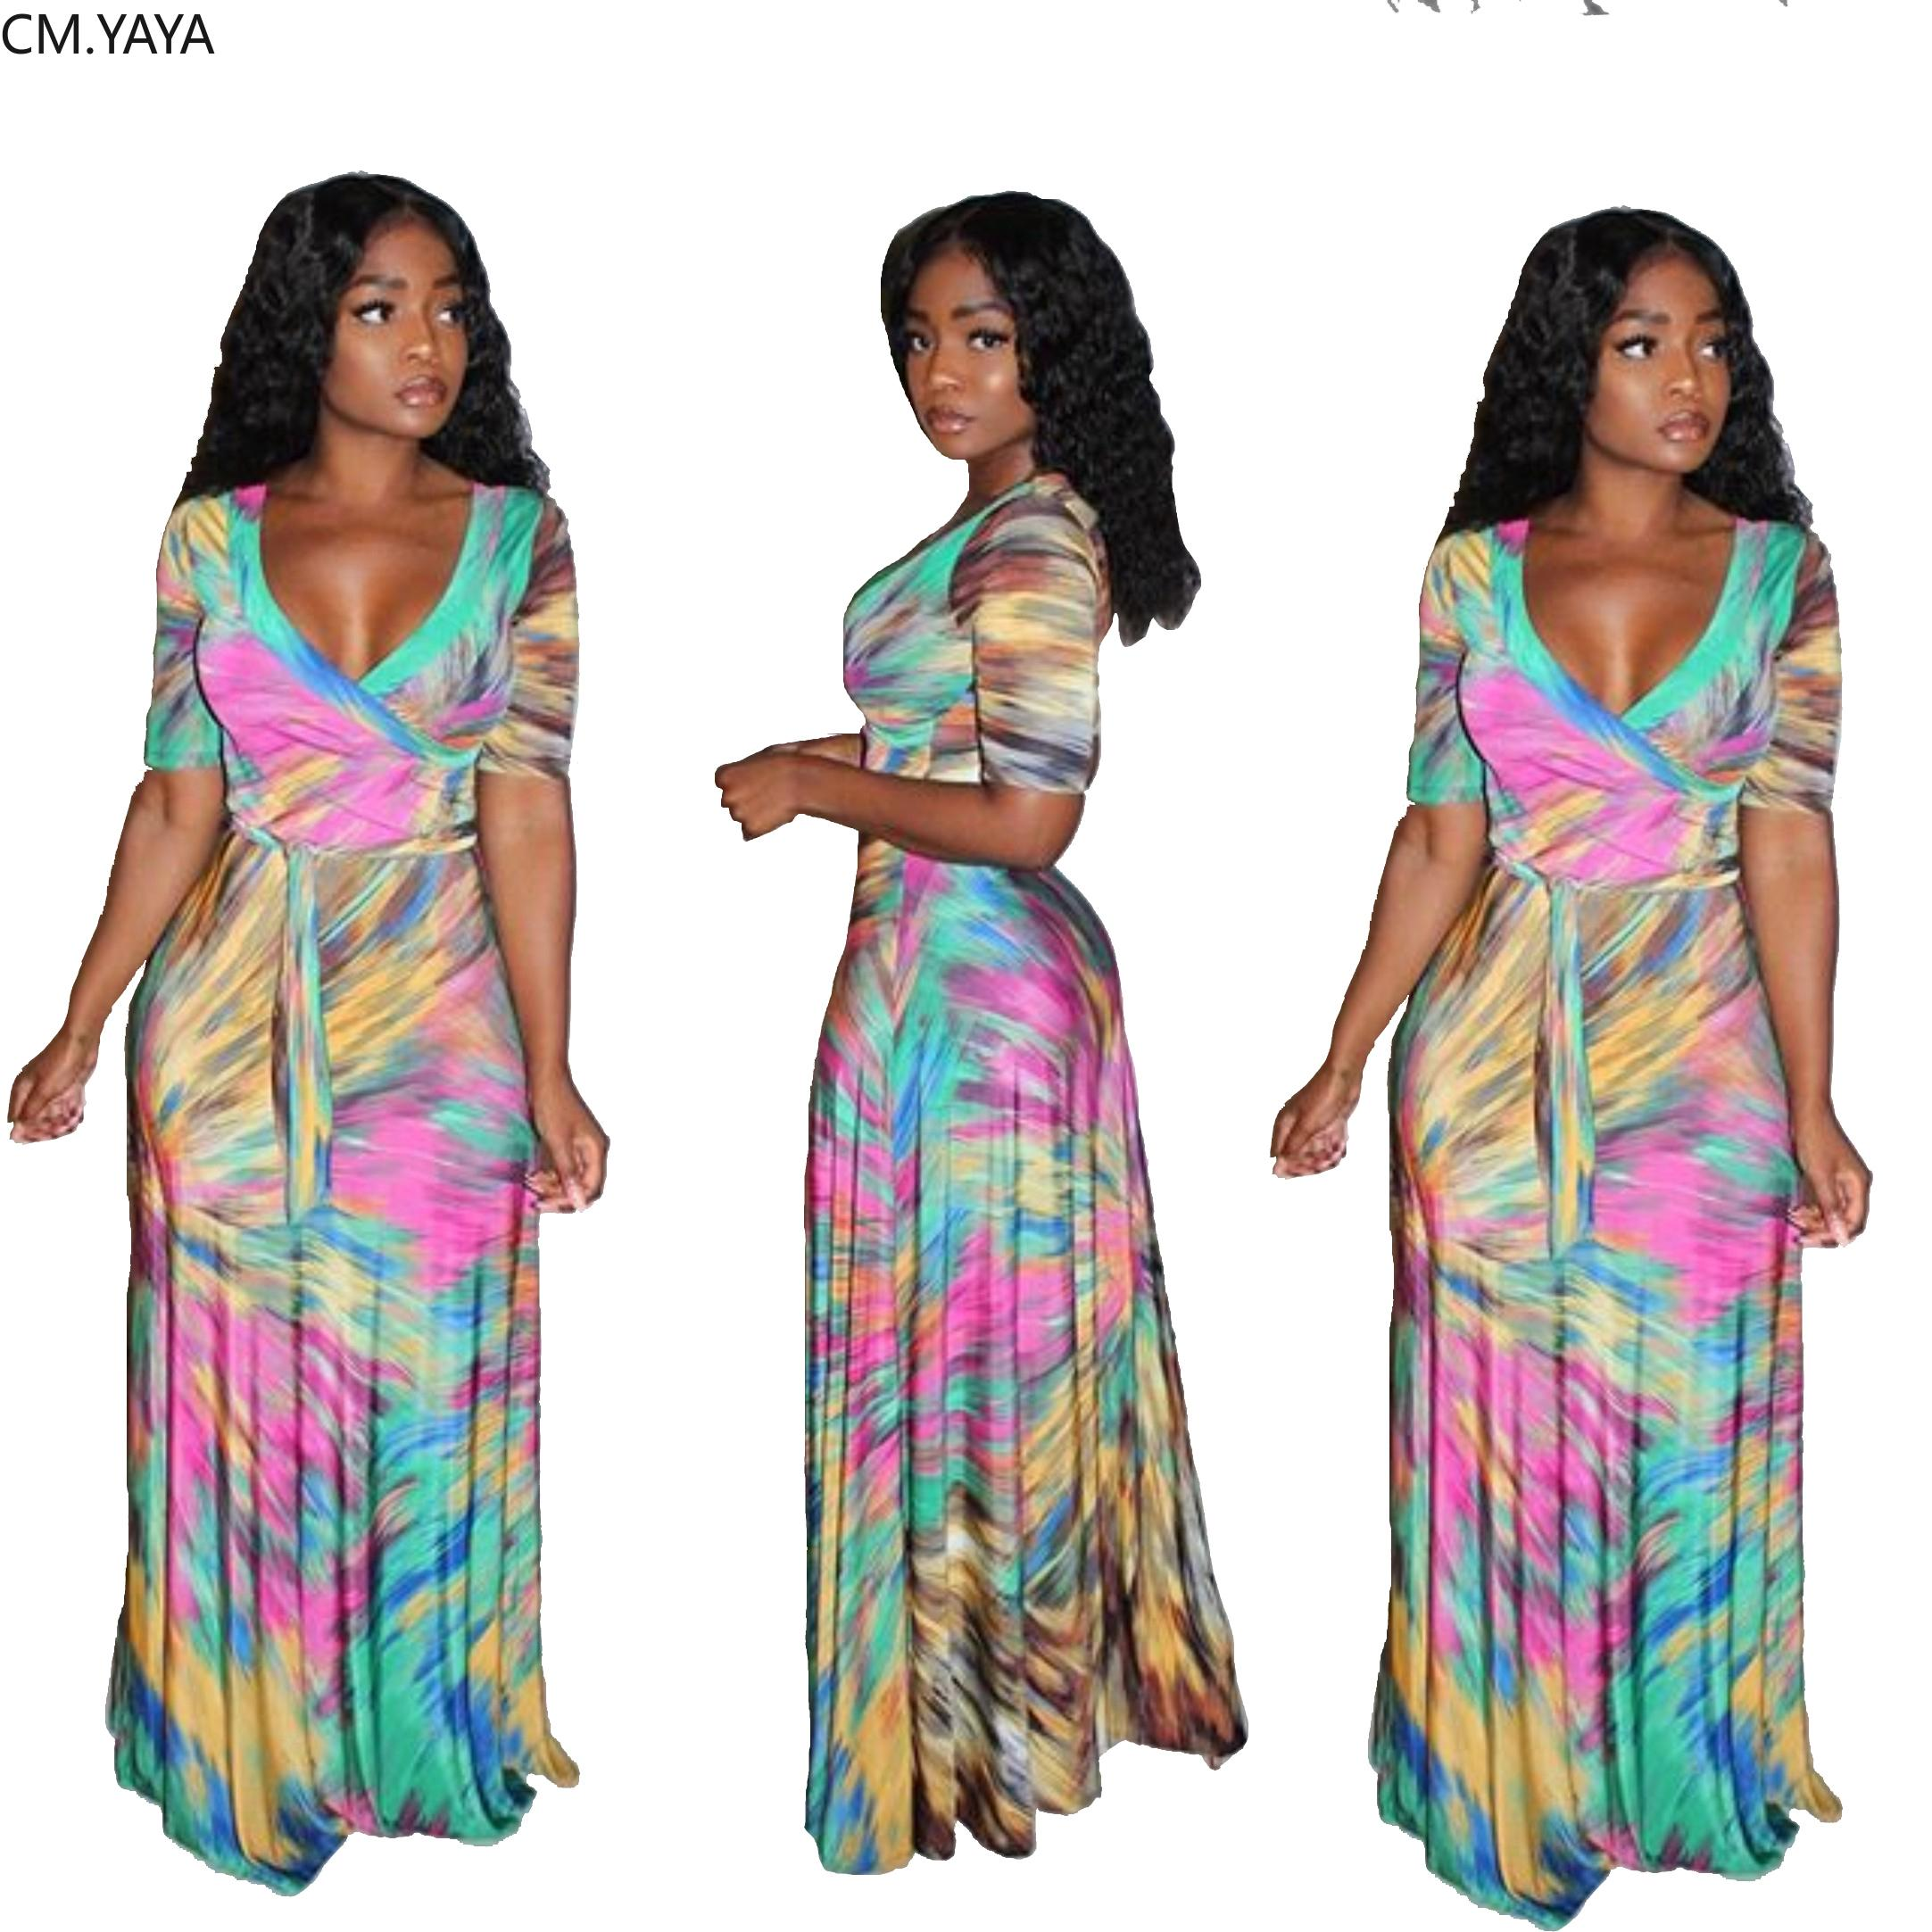 Women Dress Paisley Tie Dye Print V-neck Maxi Dress Stretch Short Sleeve Bodycon Fit & Flare Night Long Dresses Vestidos